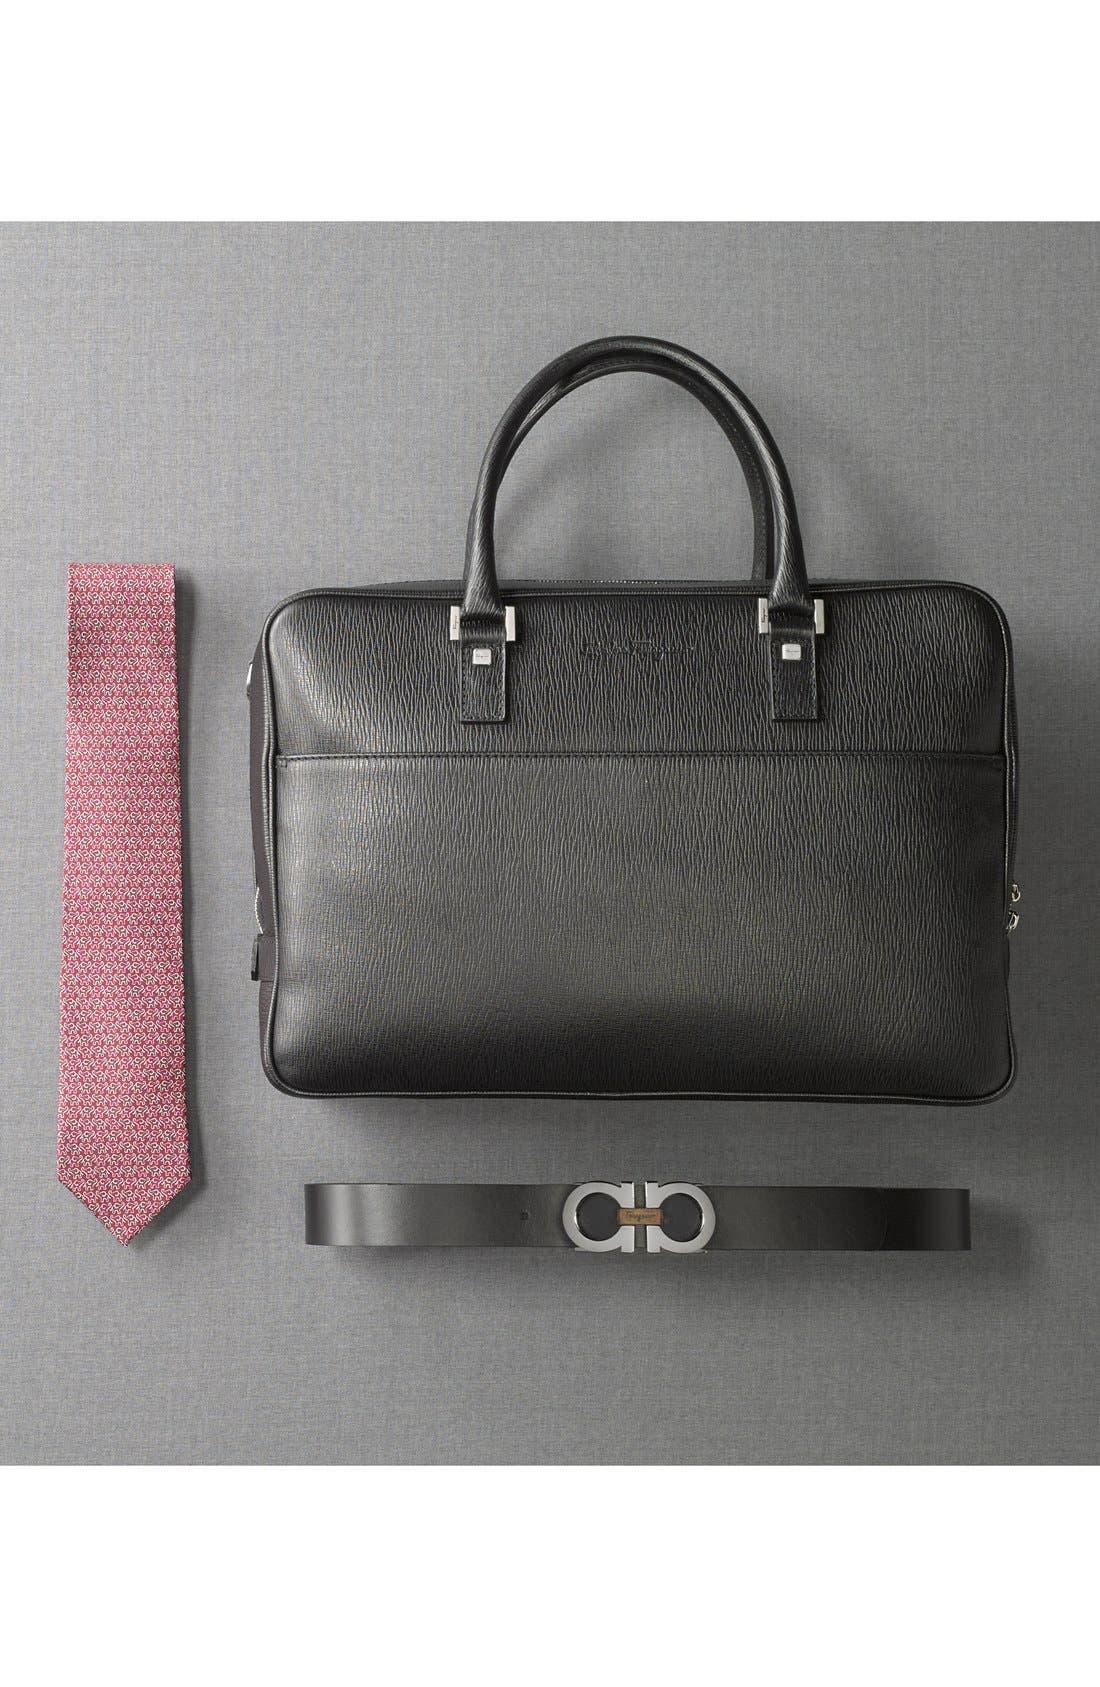 Reversible Leather Belt,                             Alternate thumbnail 4, color,                             Black/ Brown